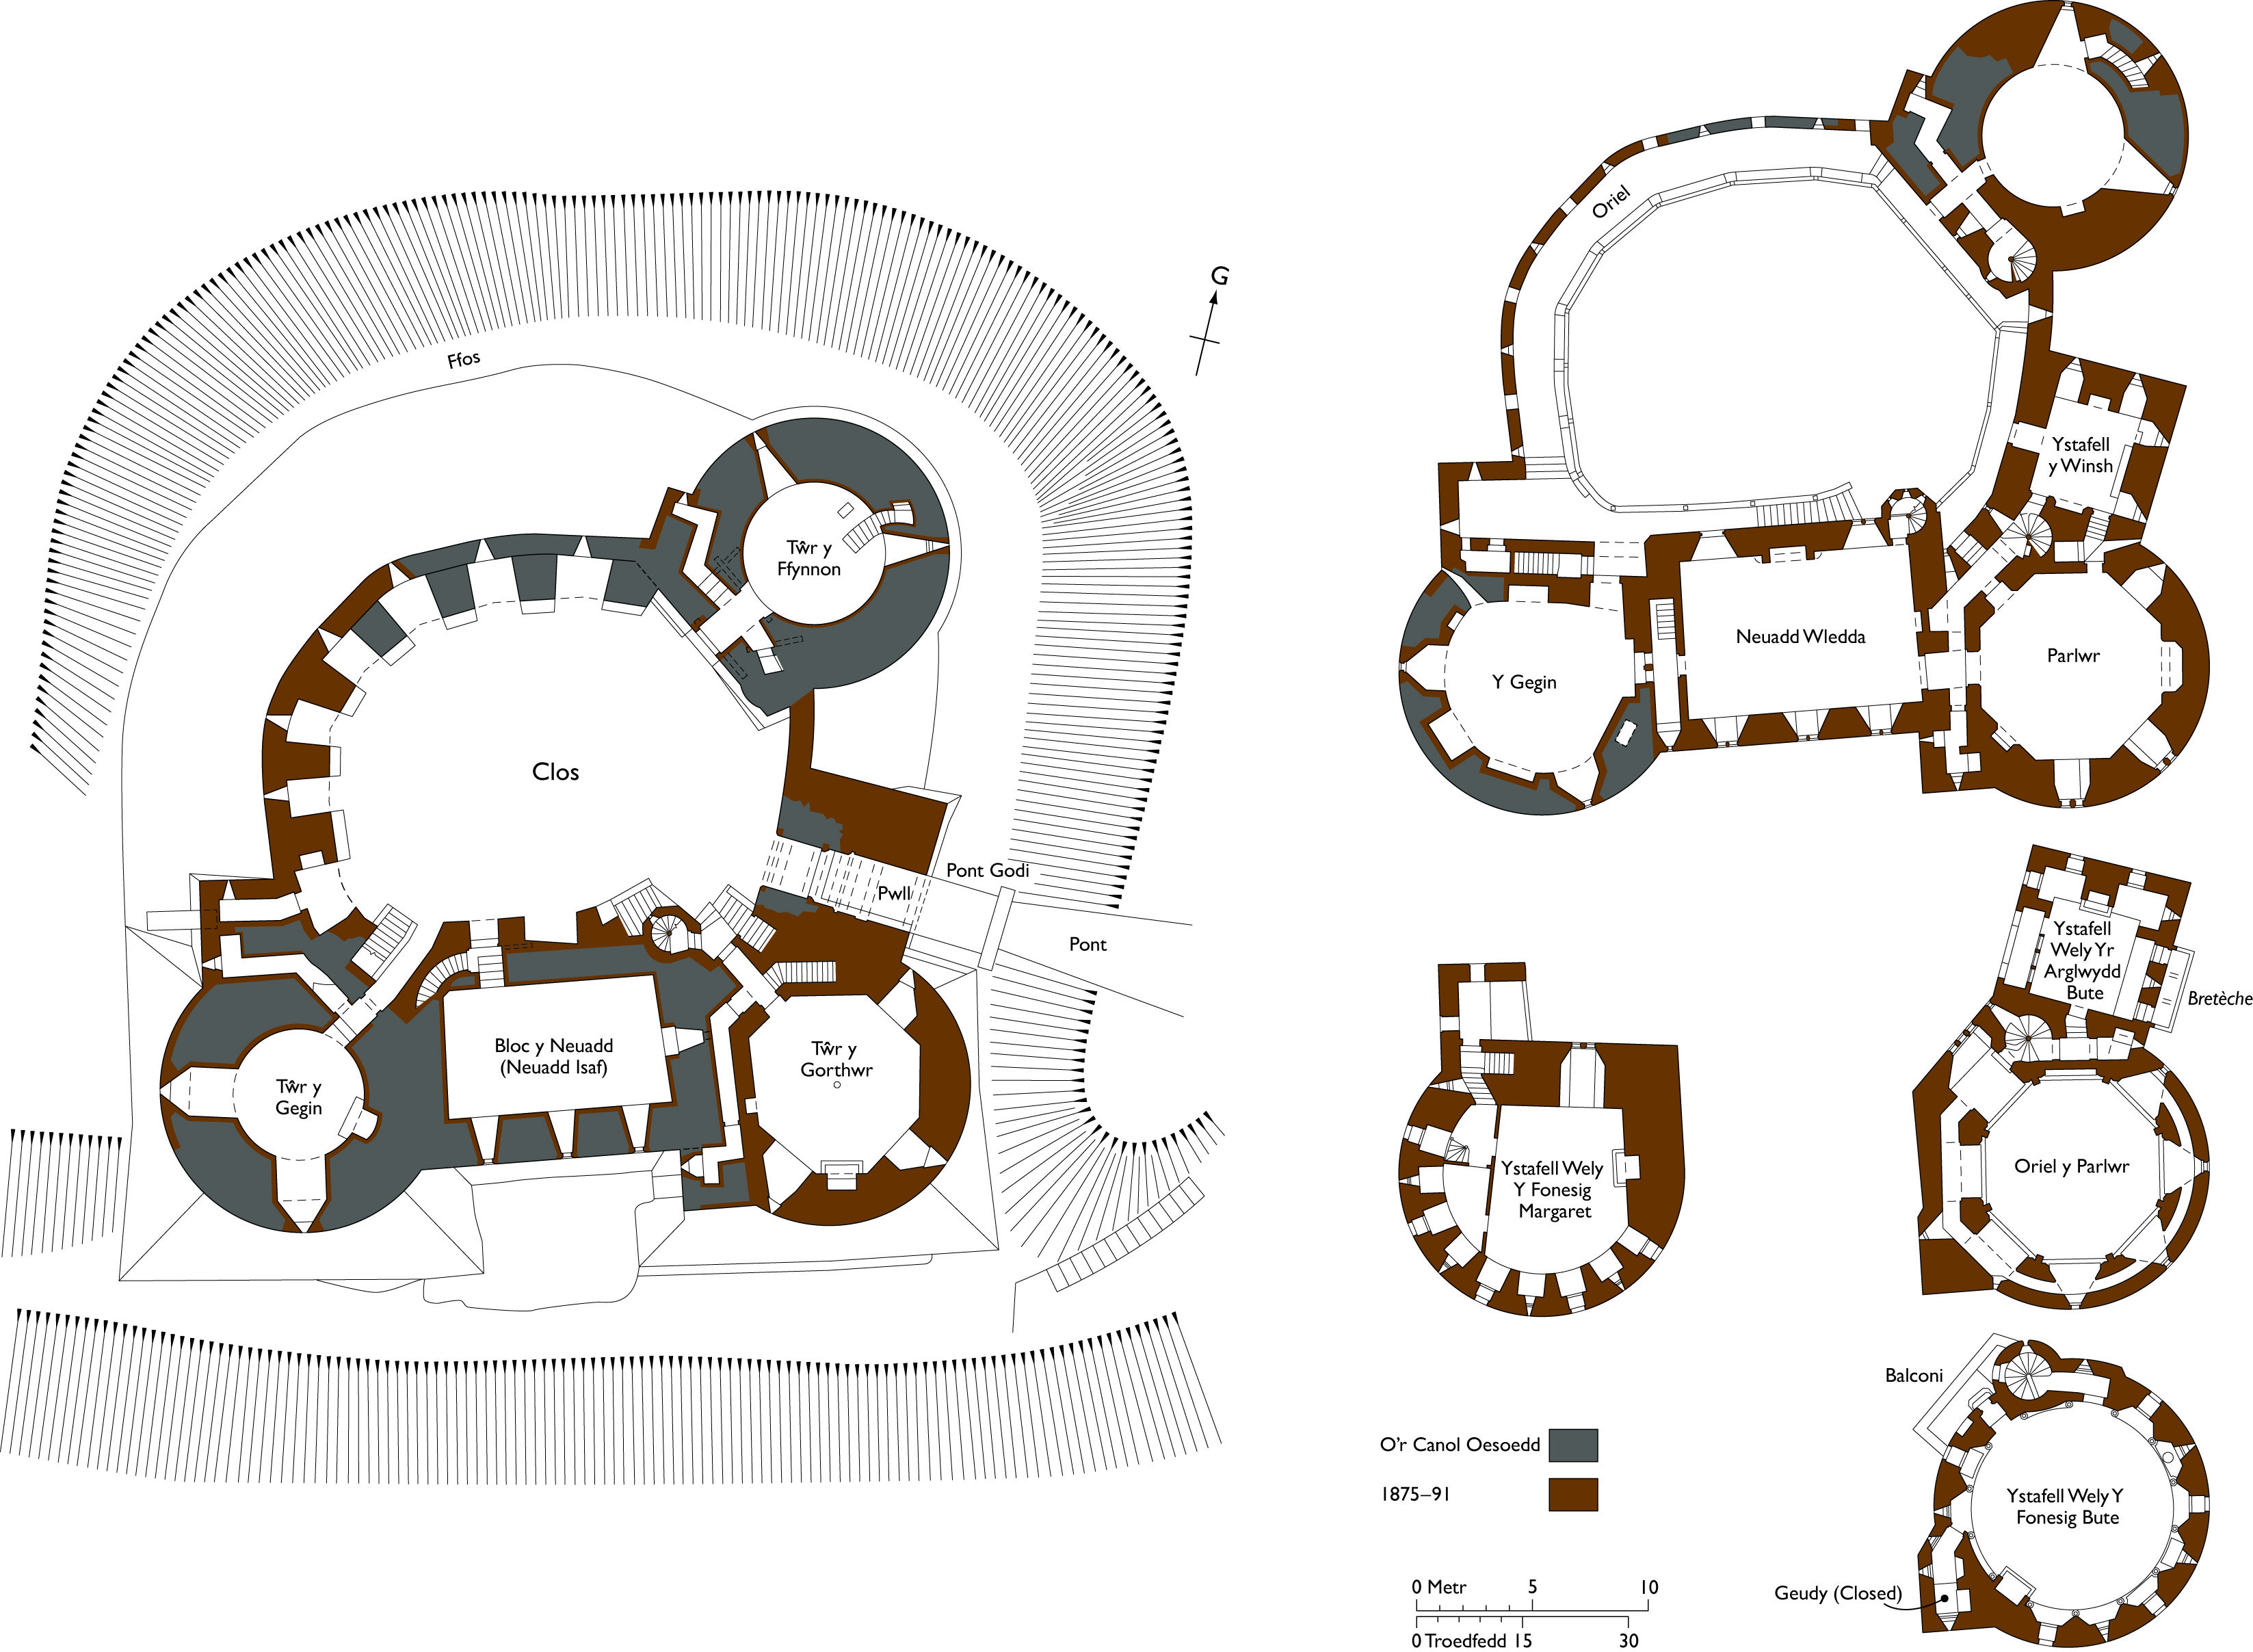 Ground Plan Castell Coch Castle Plans Castle Layout History Design